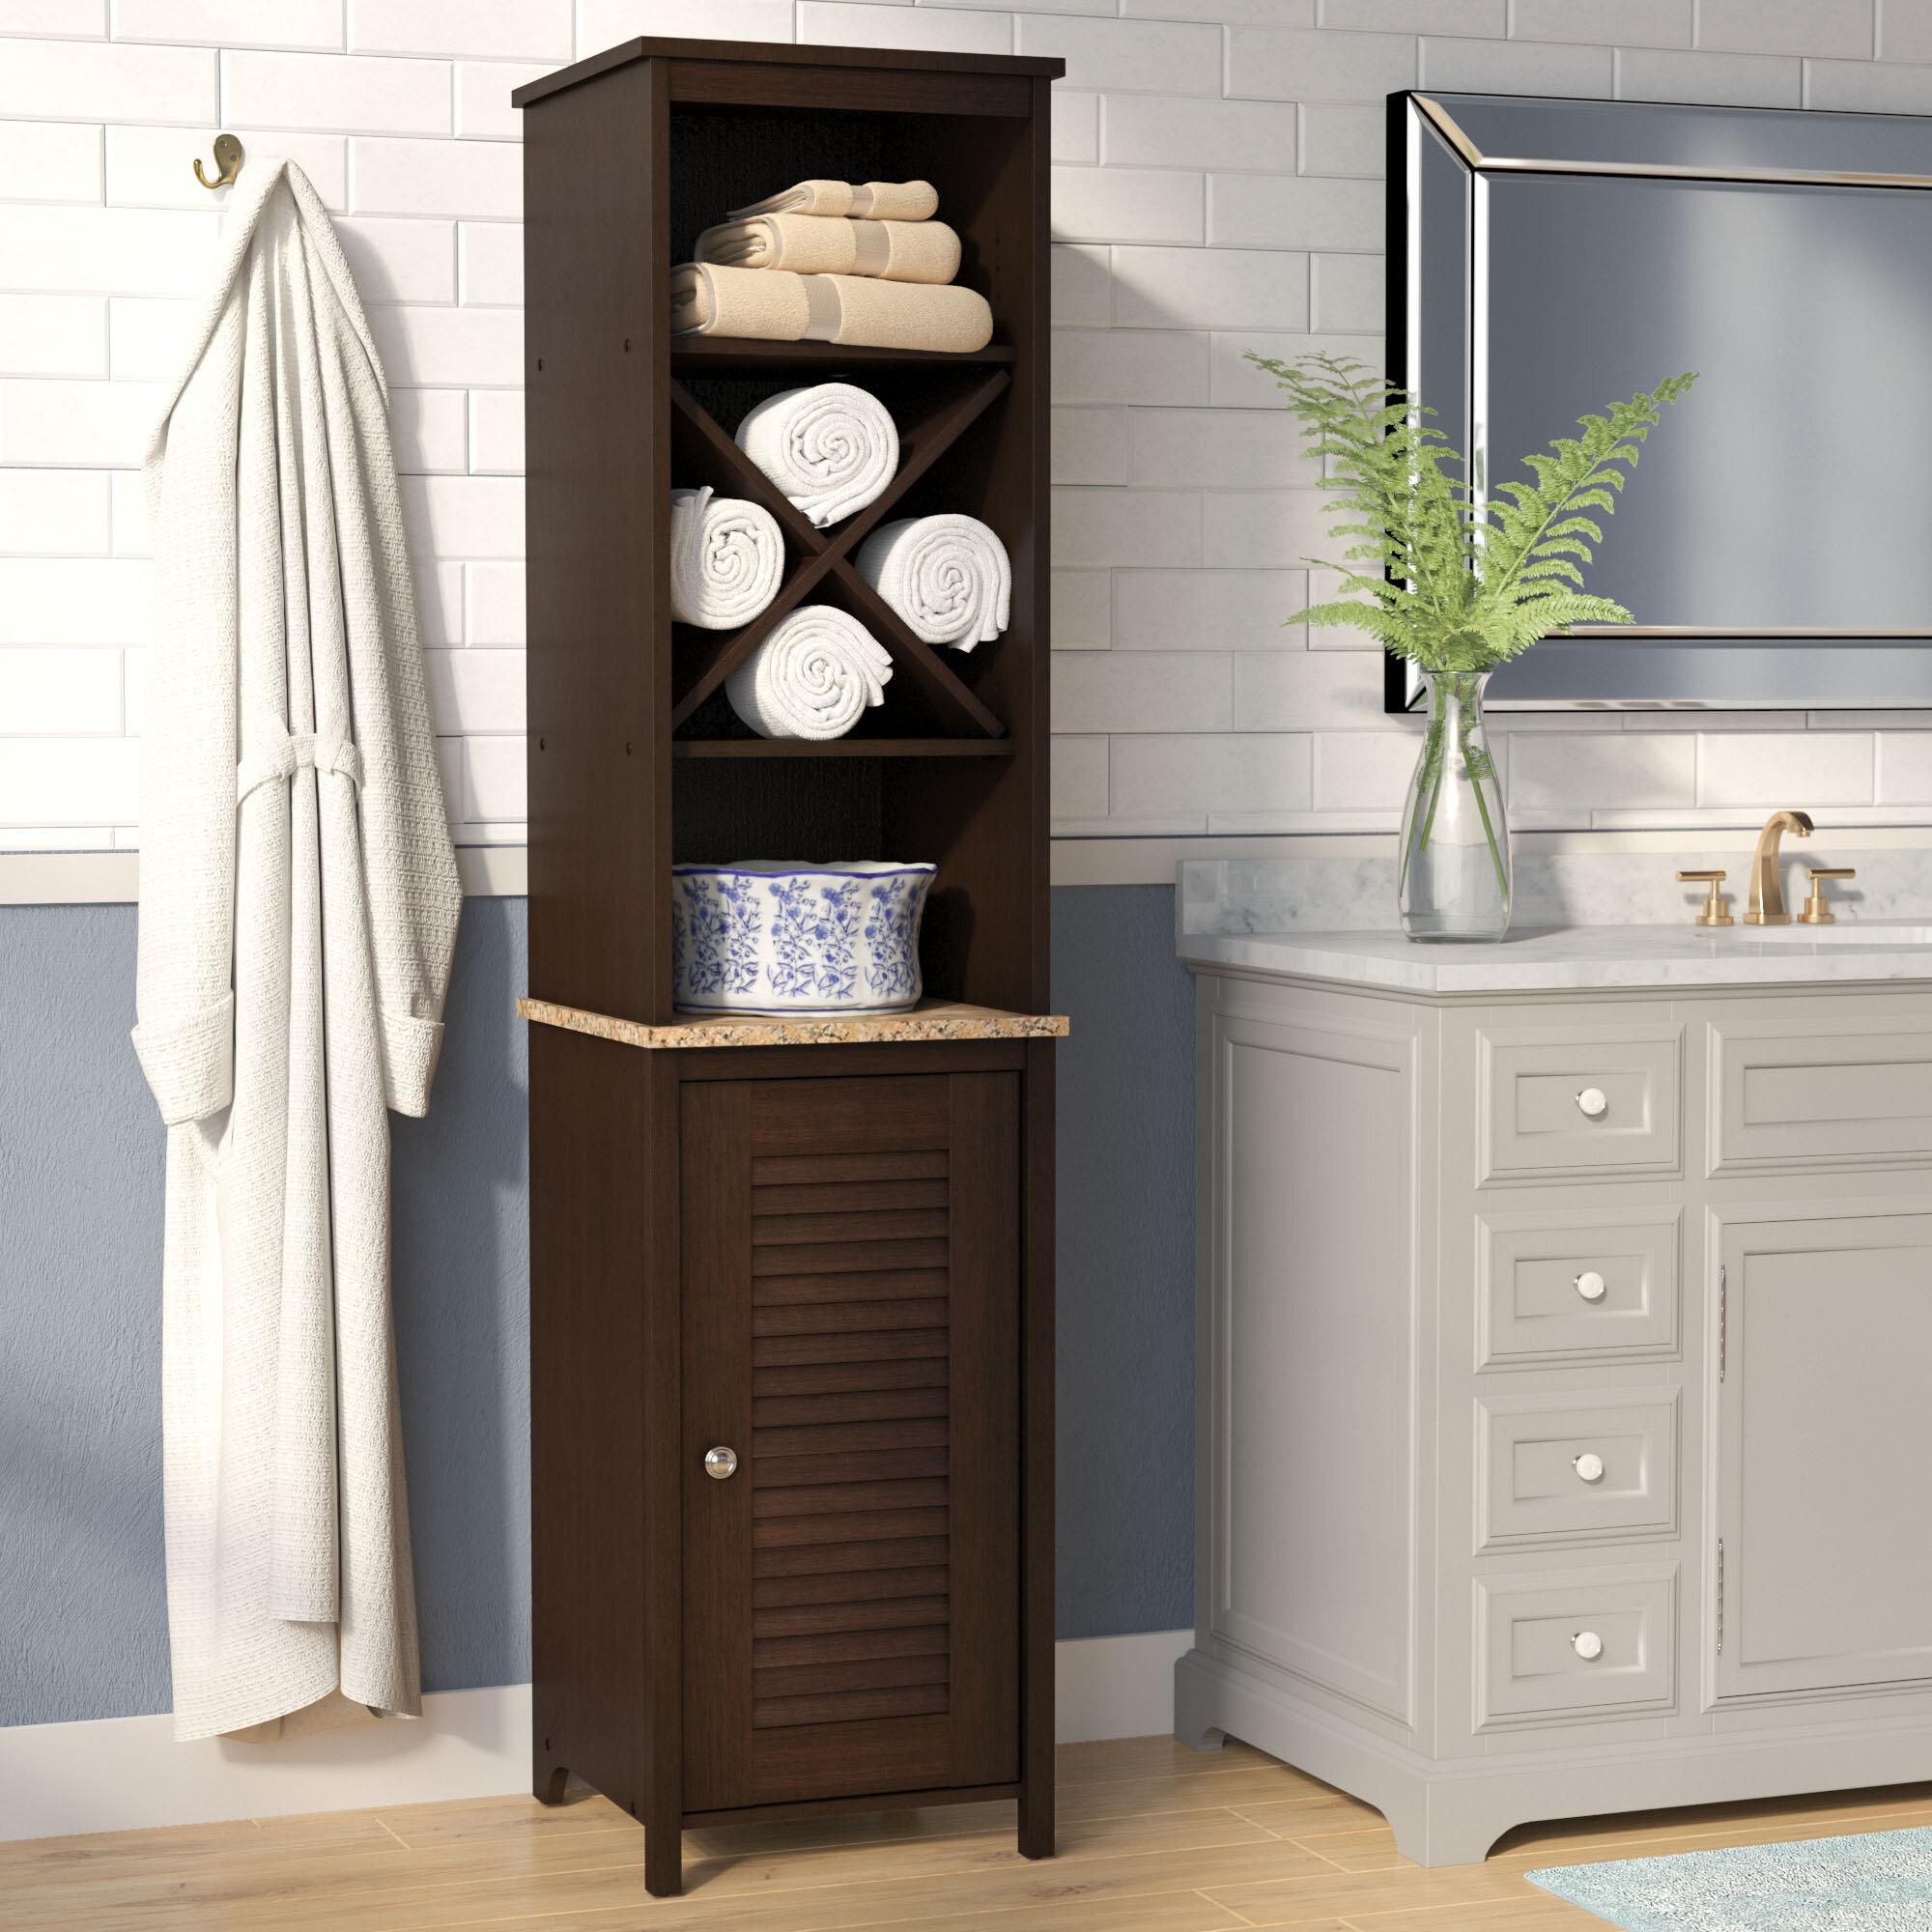 Picture of: Andover Mills Millersburg 15 W X 61 H Free Standing Linen Cabinet Reviews Wayfair